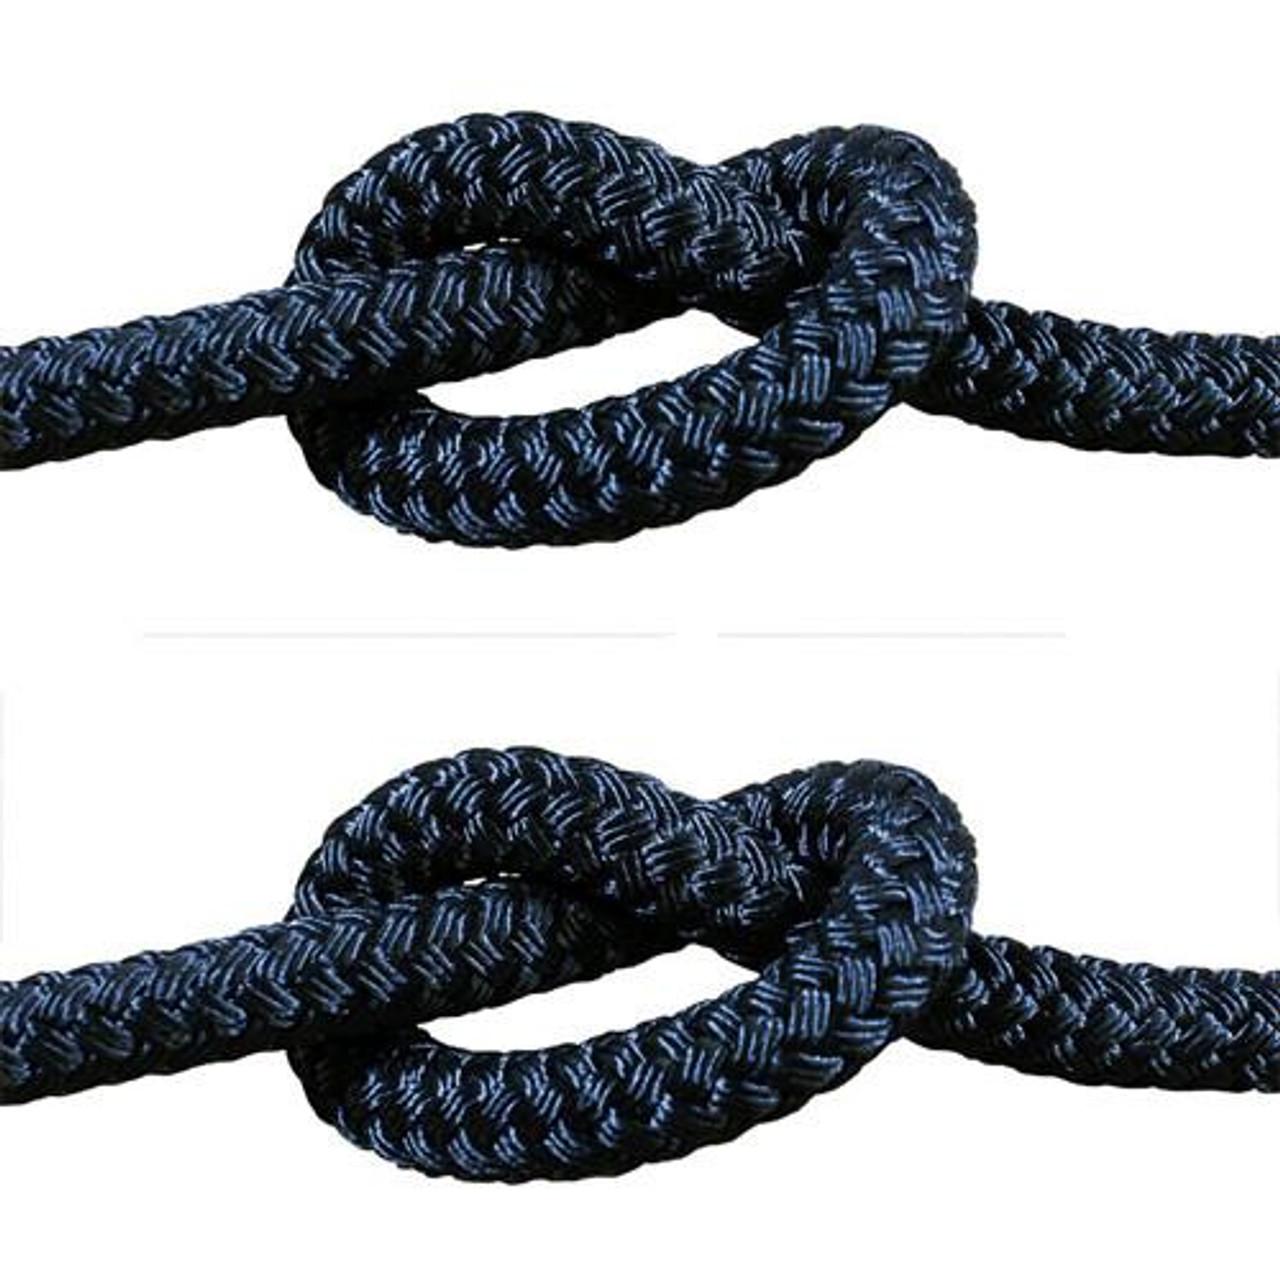 Rope - Double Braid Black 16mm x 1metre